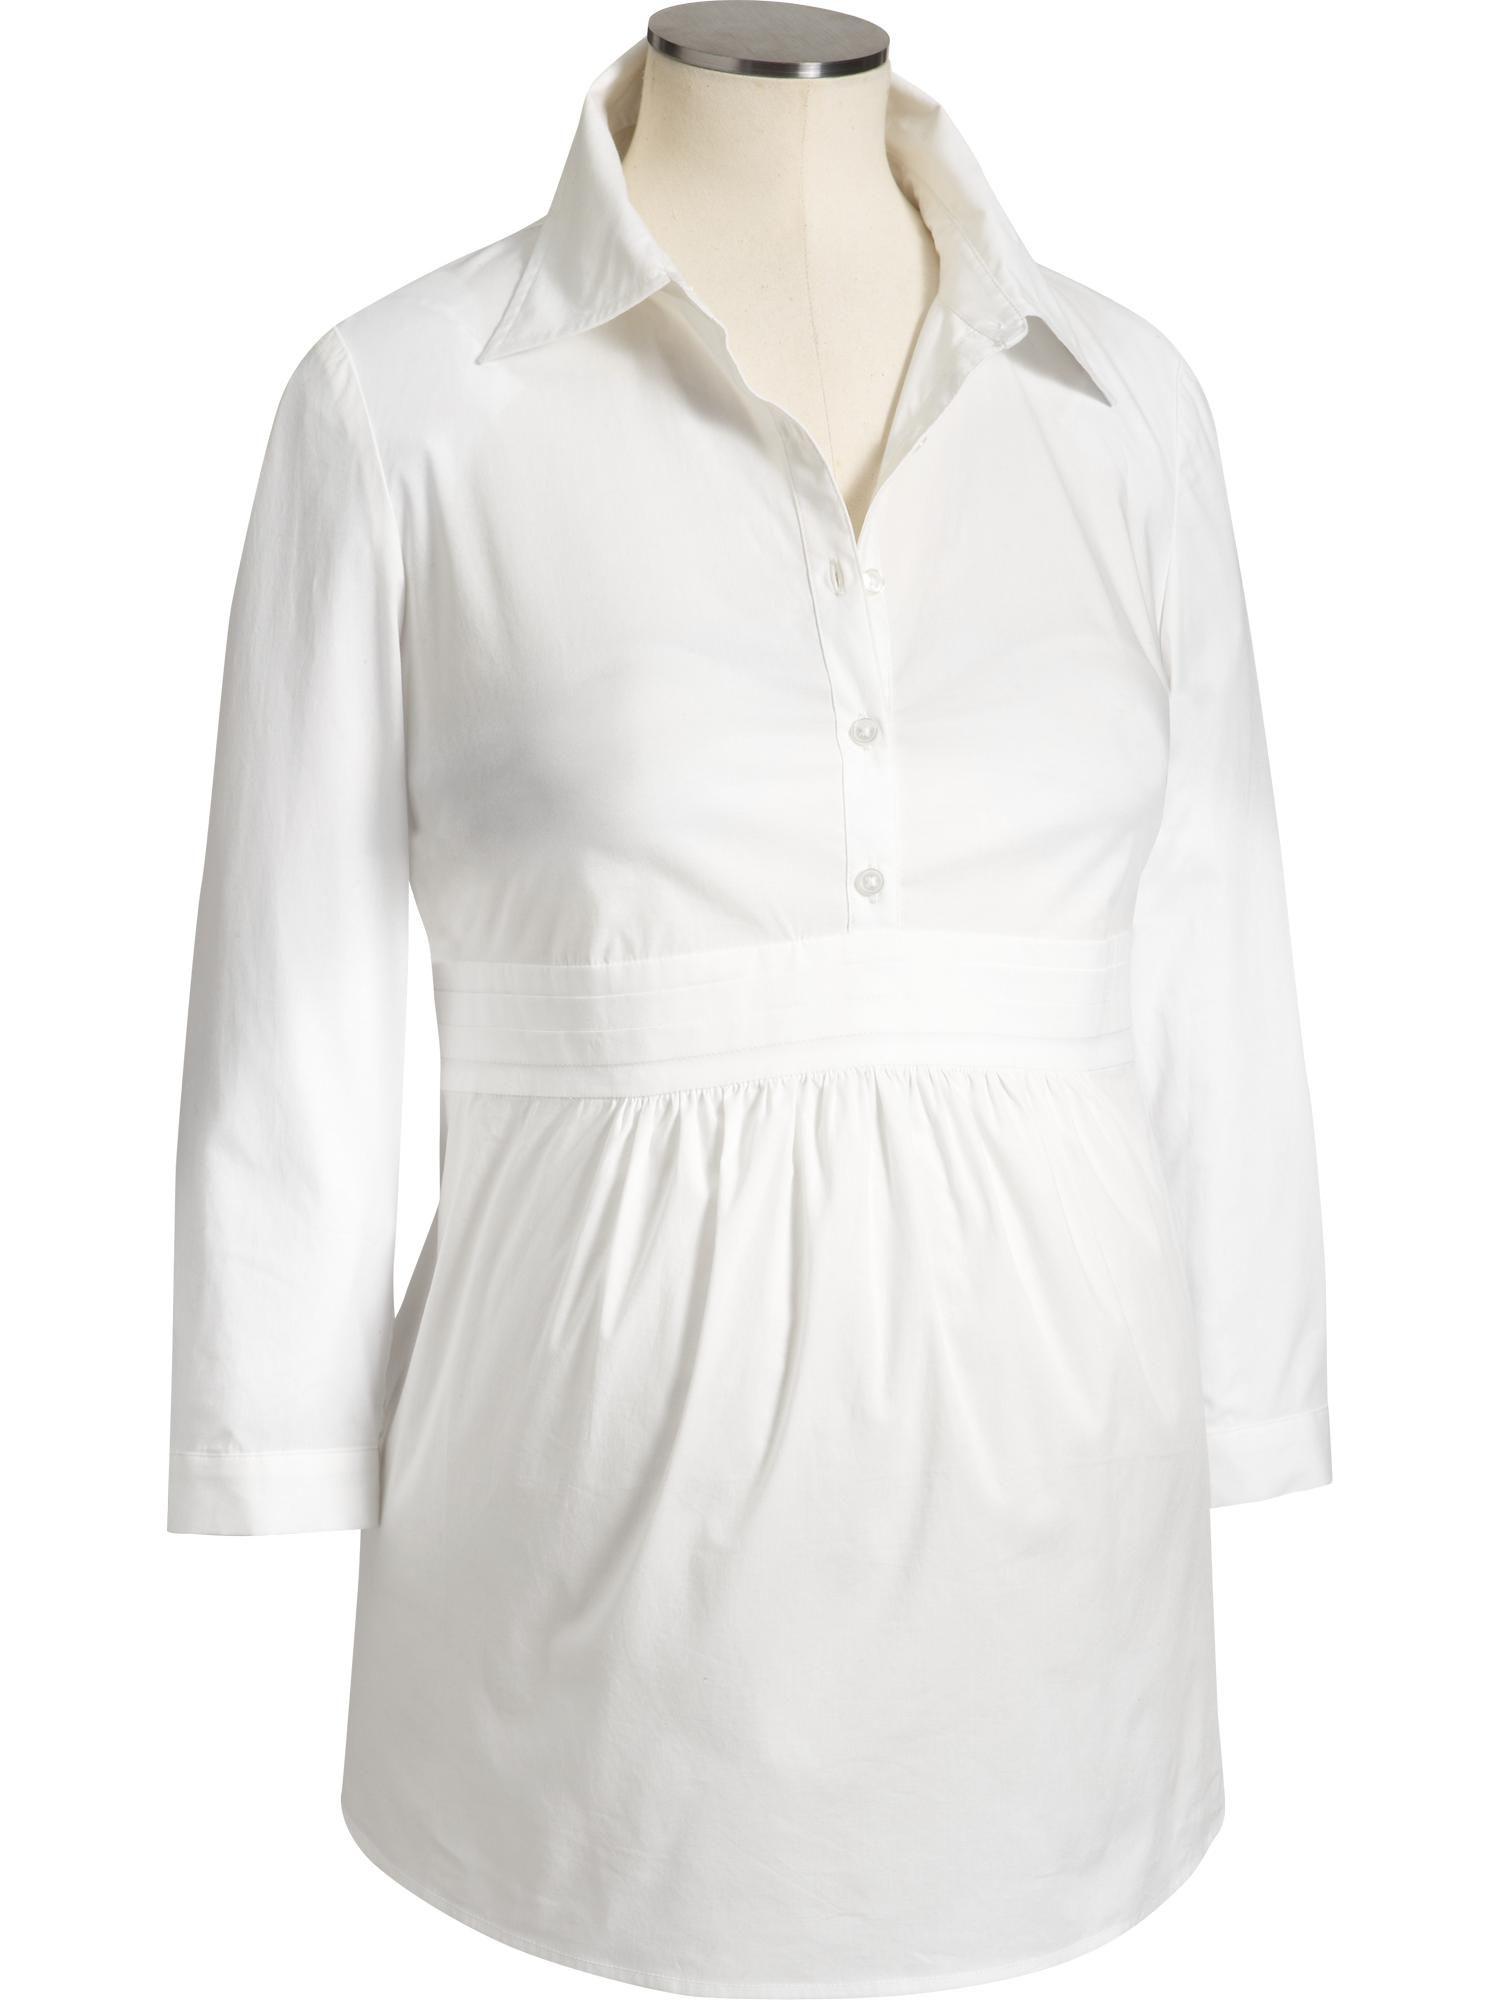 072b928f479 Old Navy. Maternity Shirt-Collar Tops.  27.50